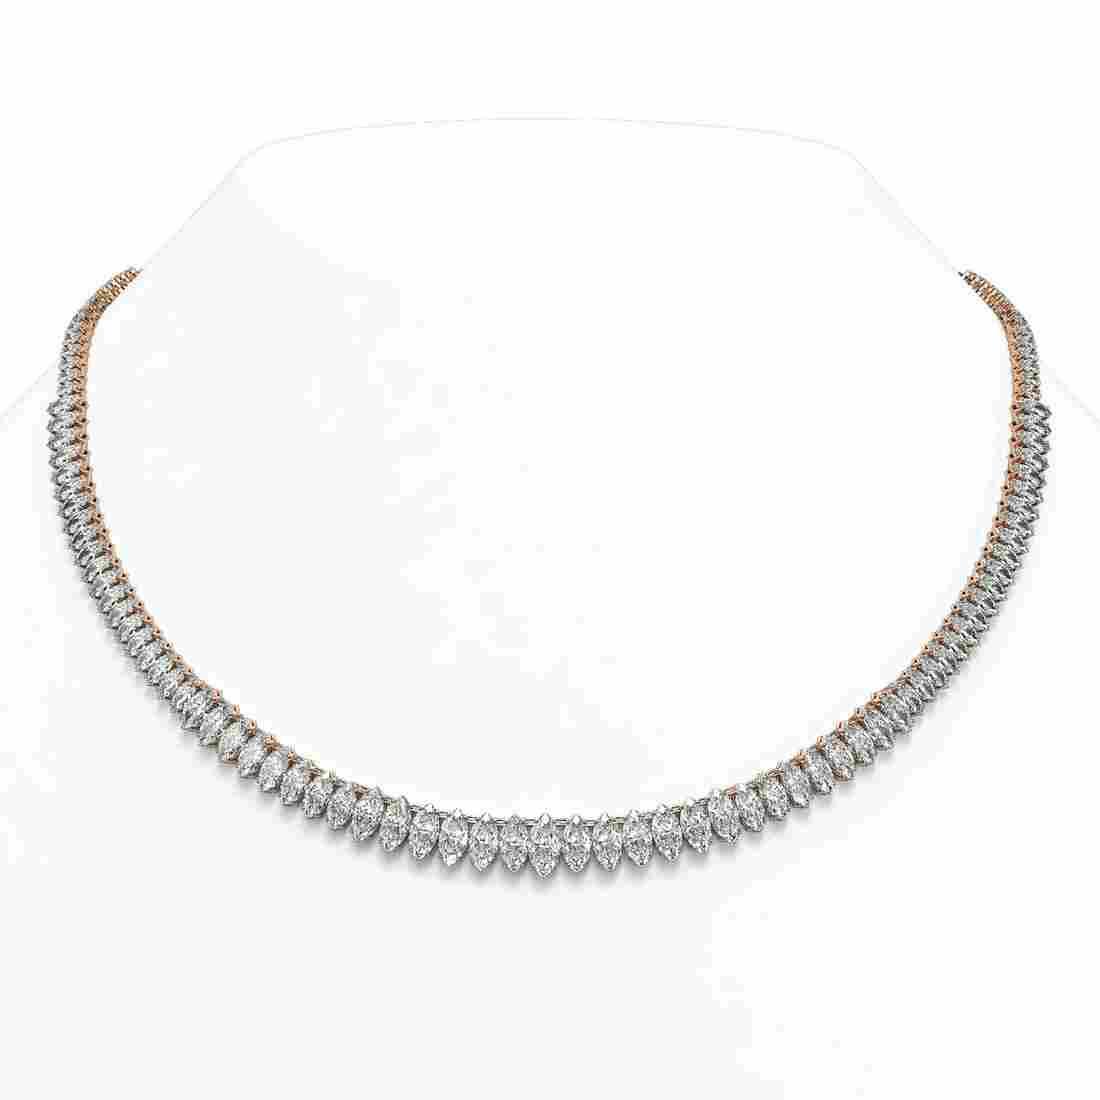 33 ctw Marquise Diamond Rare Eternity Necklace 18K Rose